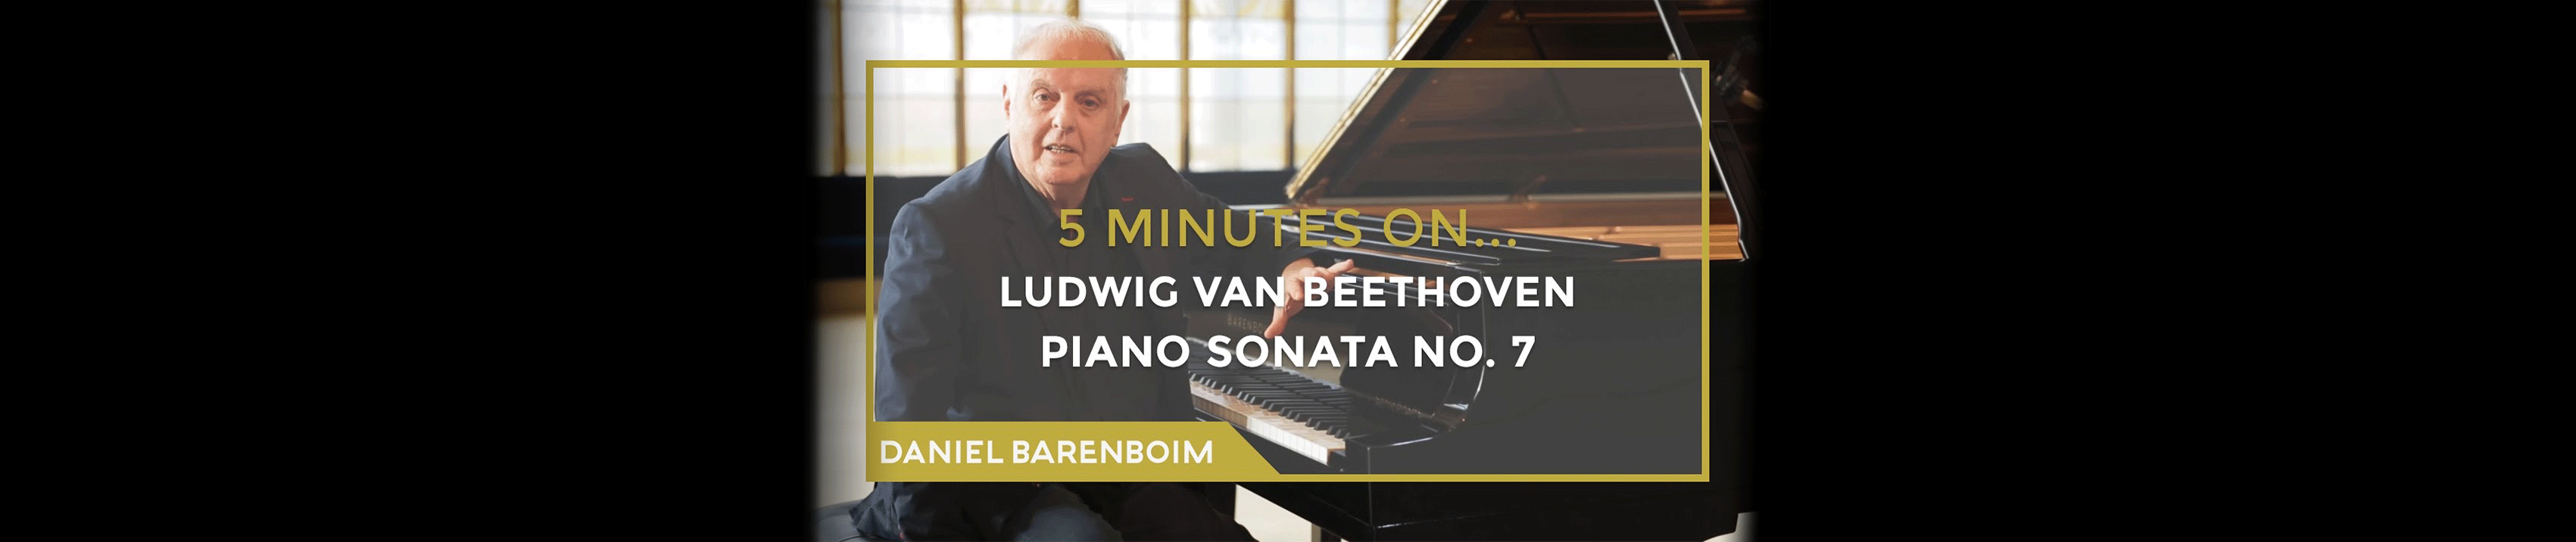 Daniel Barenboim, Beethoven's Piano Sonata No. 7